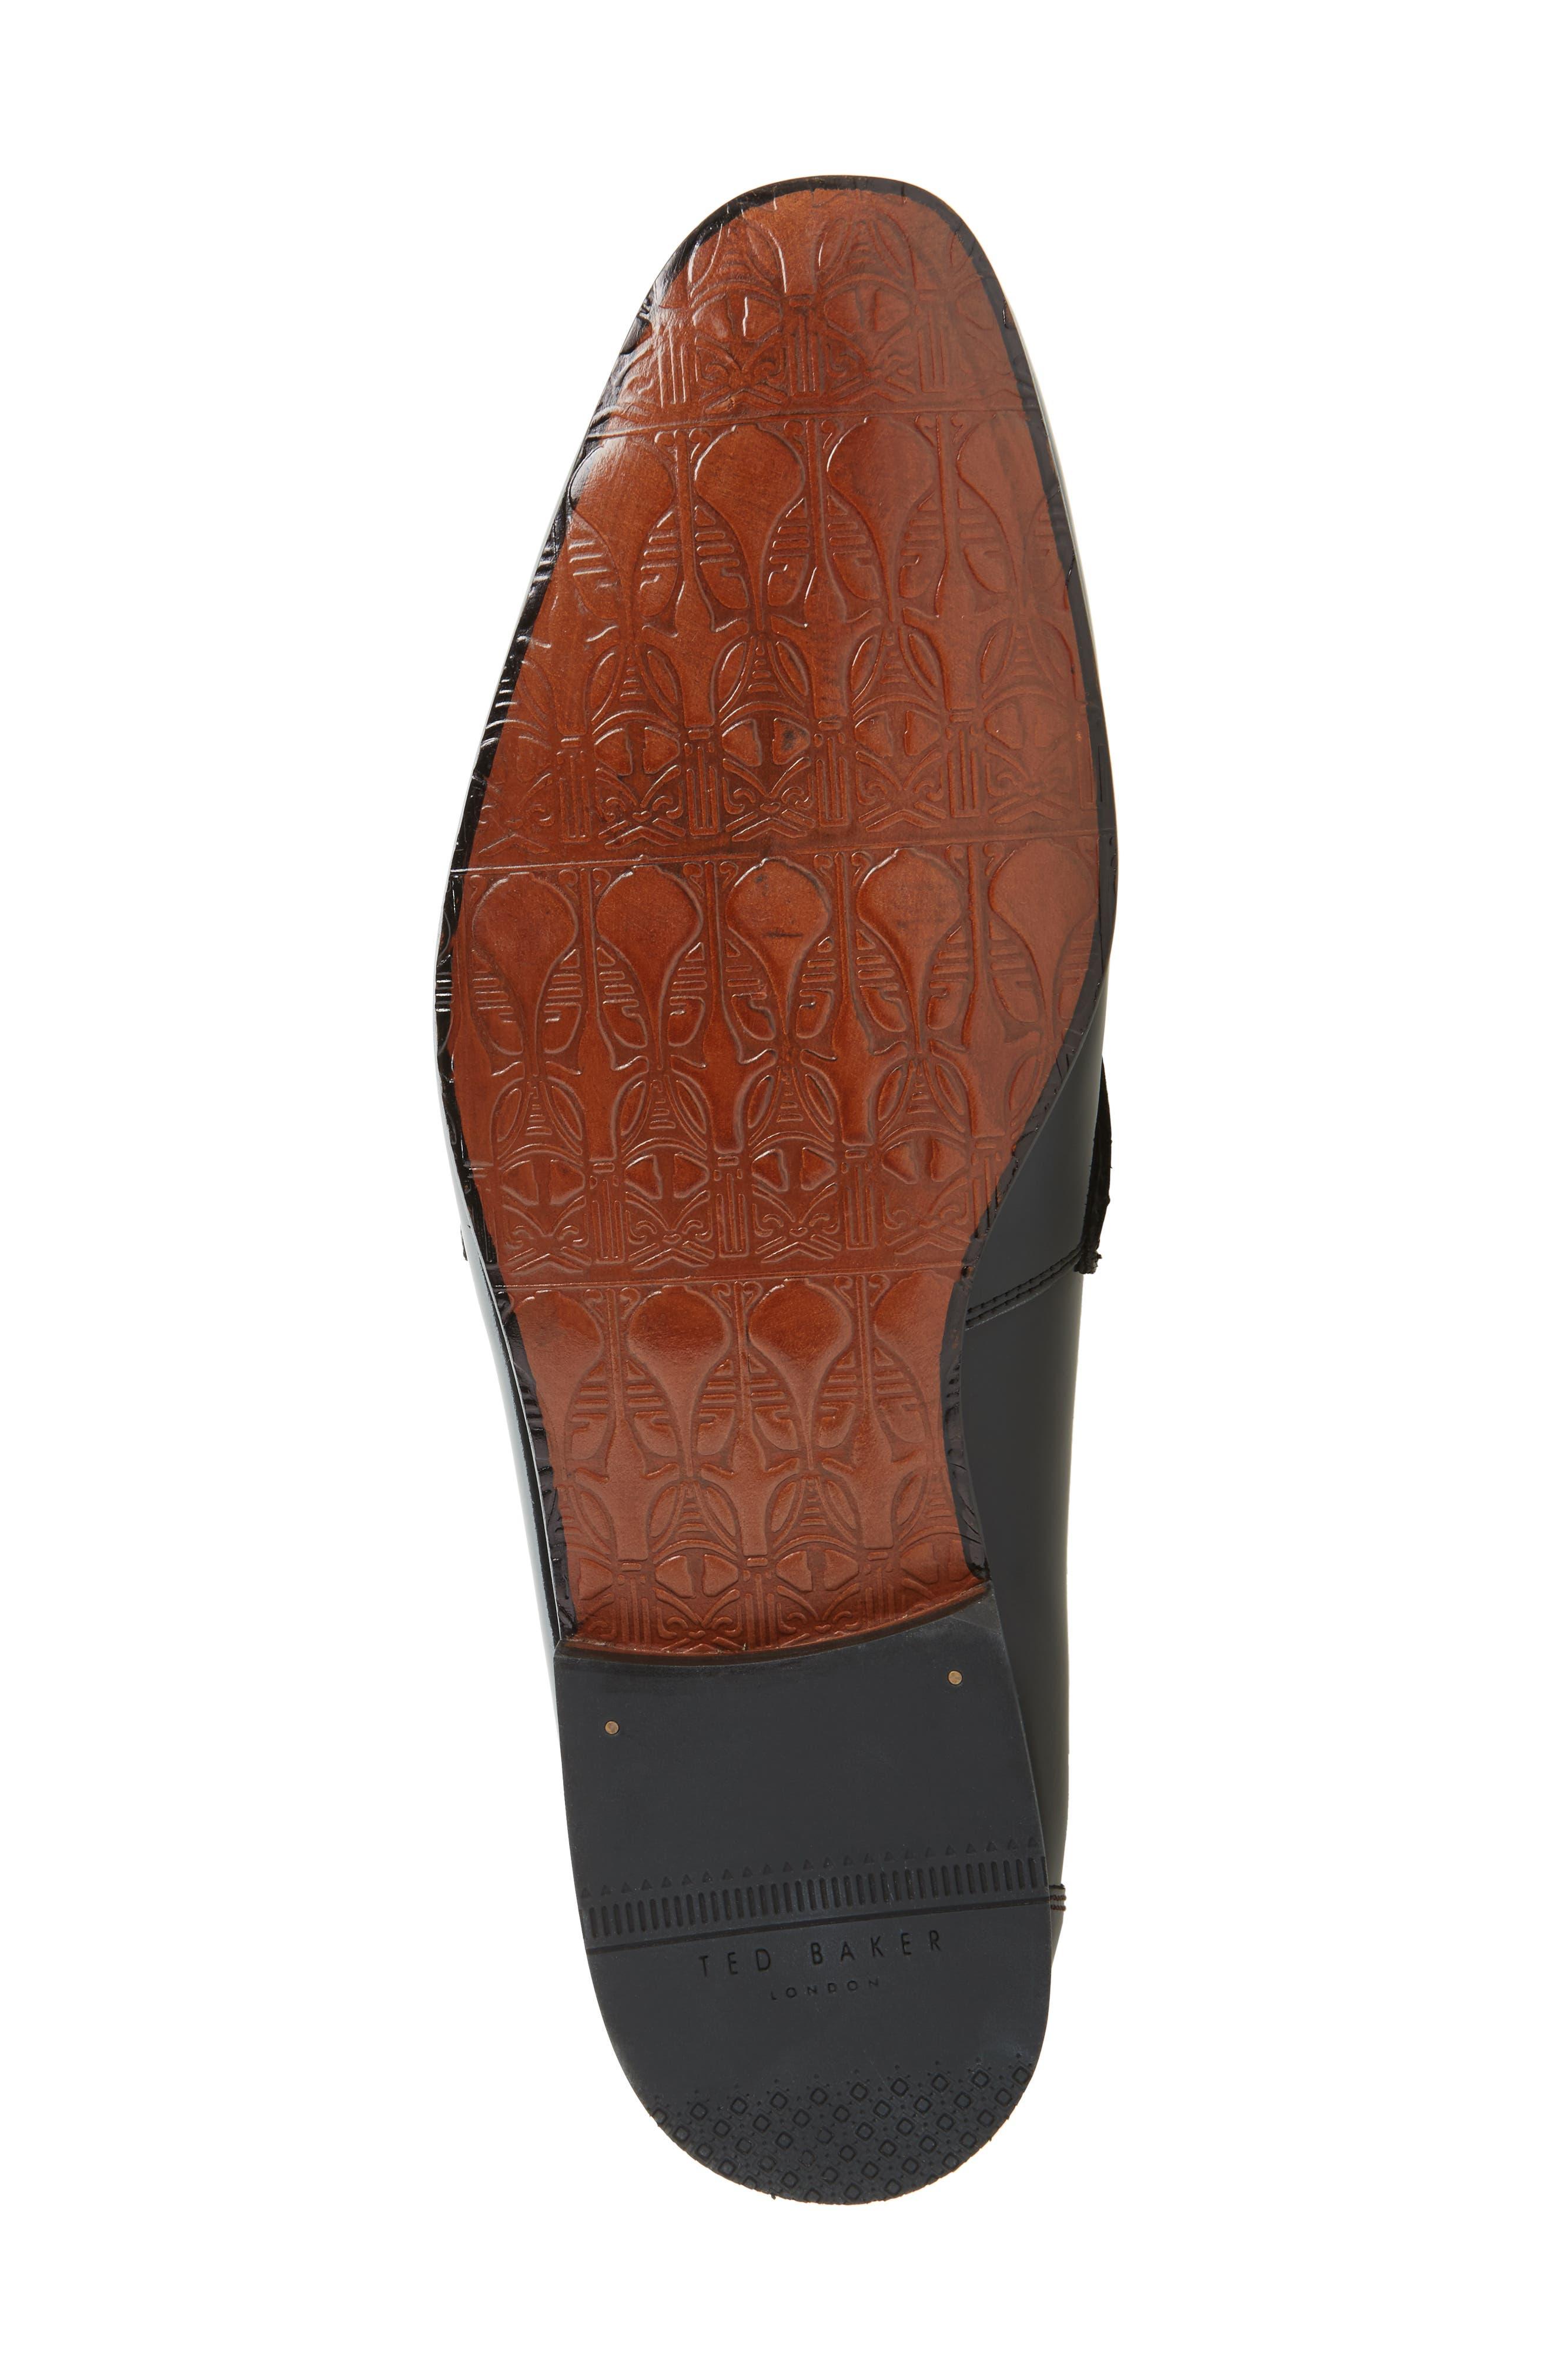 Grafit Tassel Loafer,                             Alternate thumbnail 6, color,                             Black Patent Leather